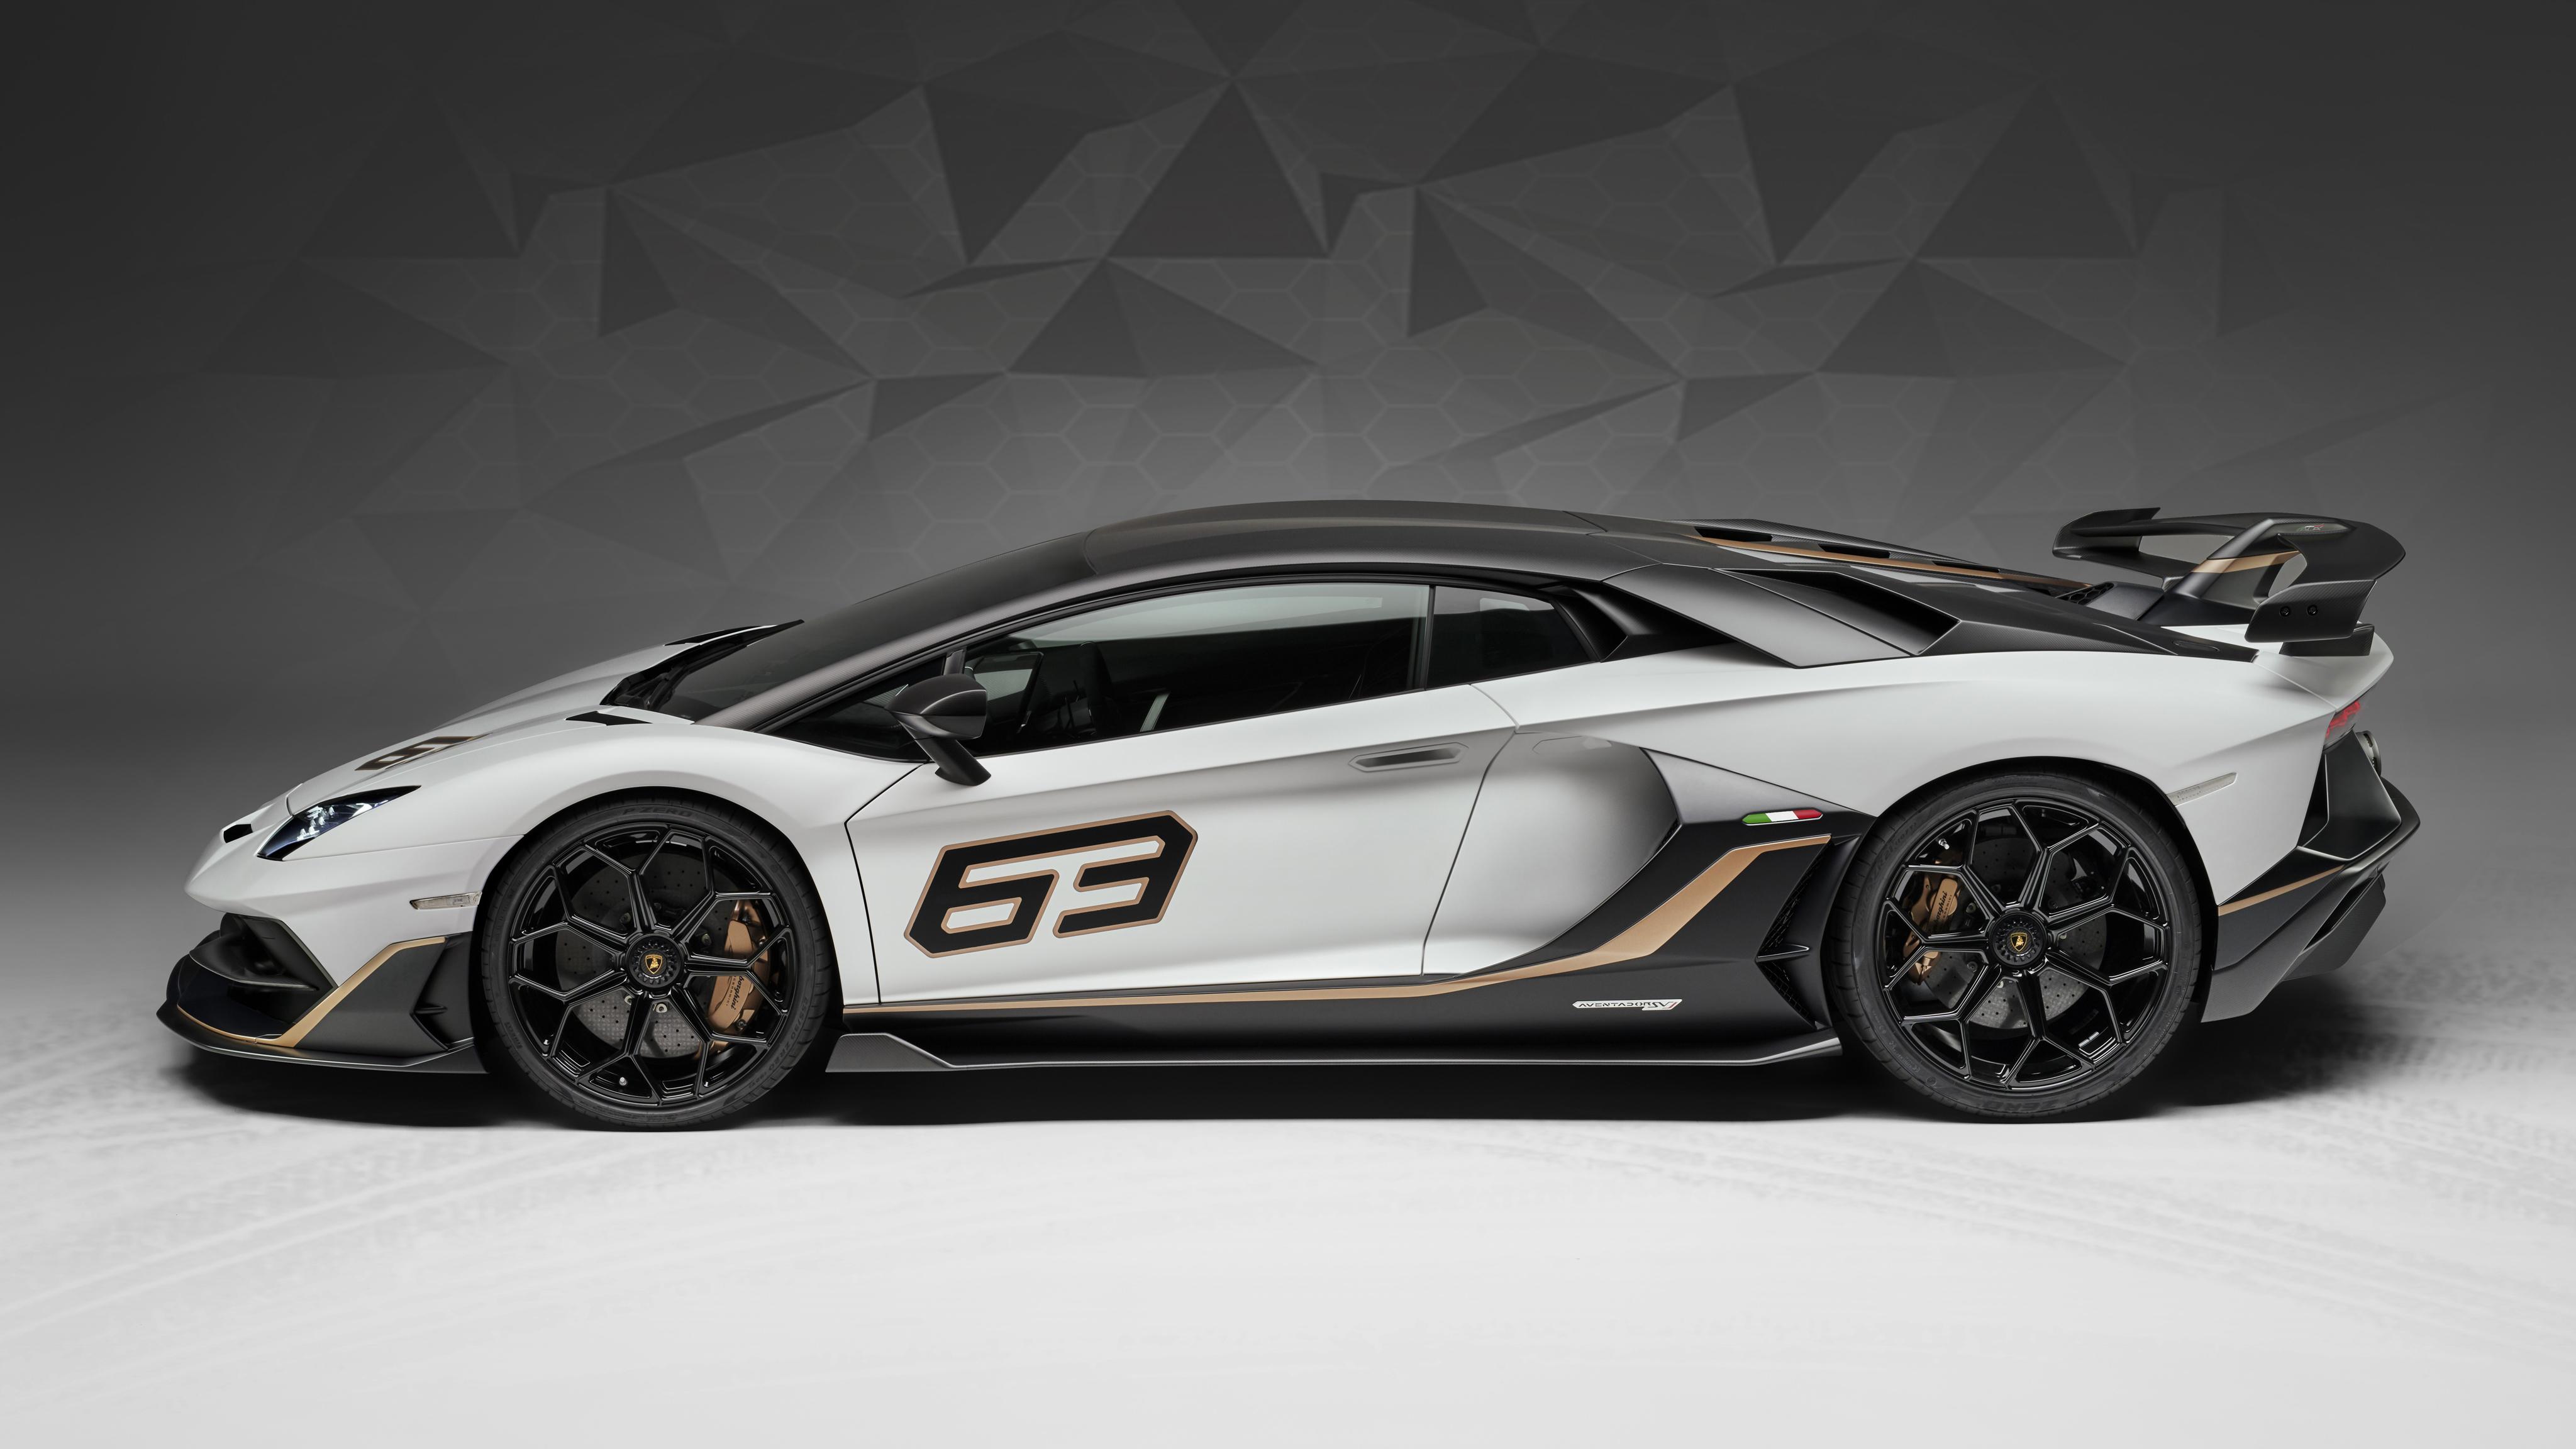 Lamborghini Aventador Svj 63 2019 4k 3 Wallpaper Hd Car Wallpapers Id 11017